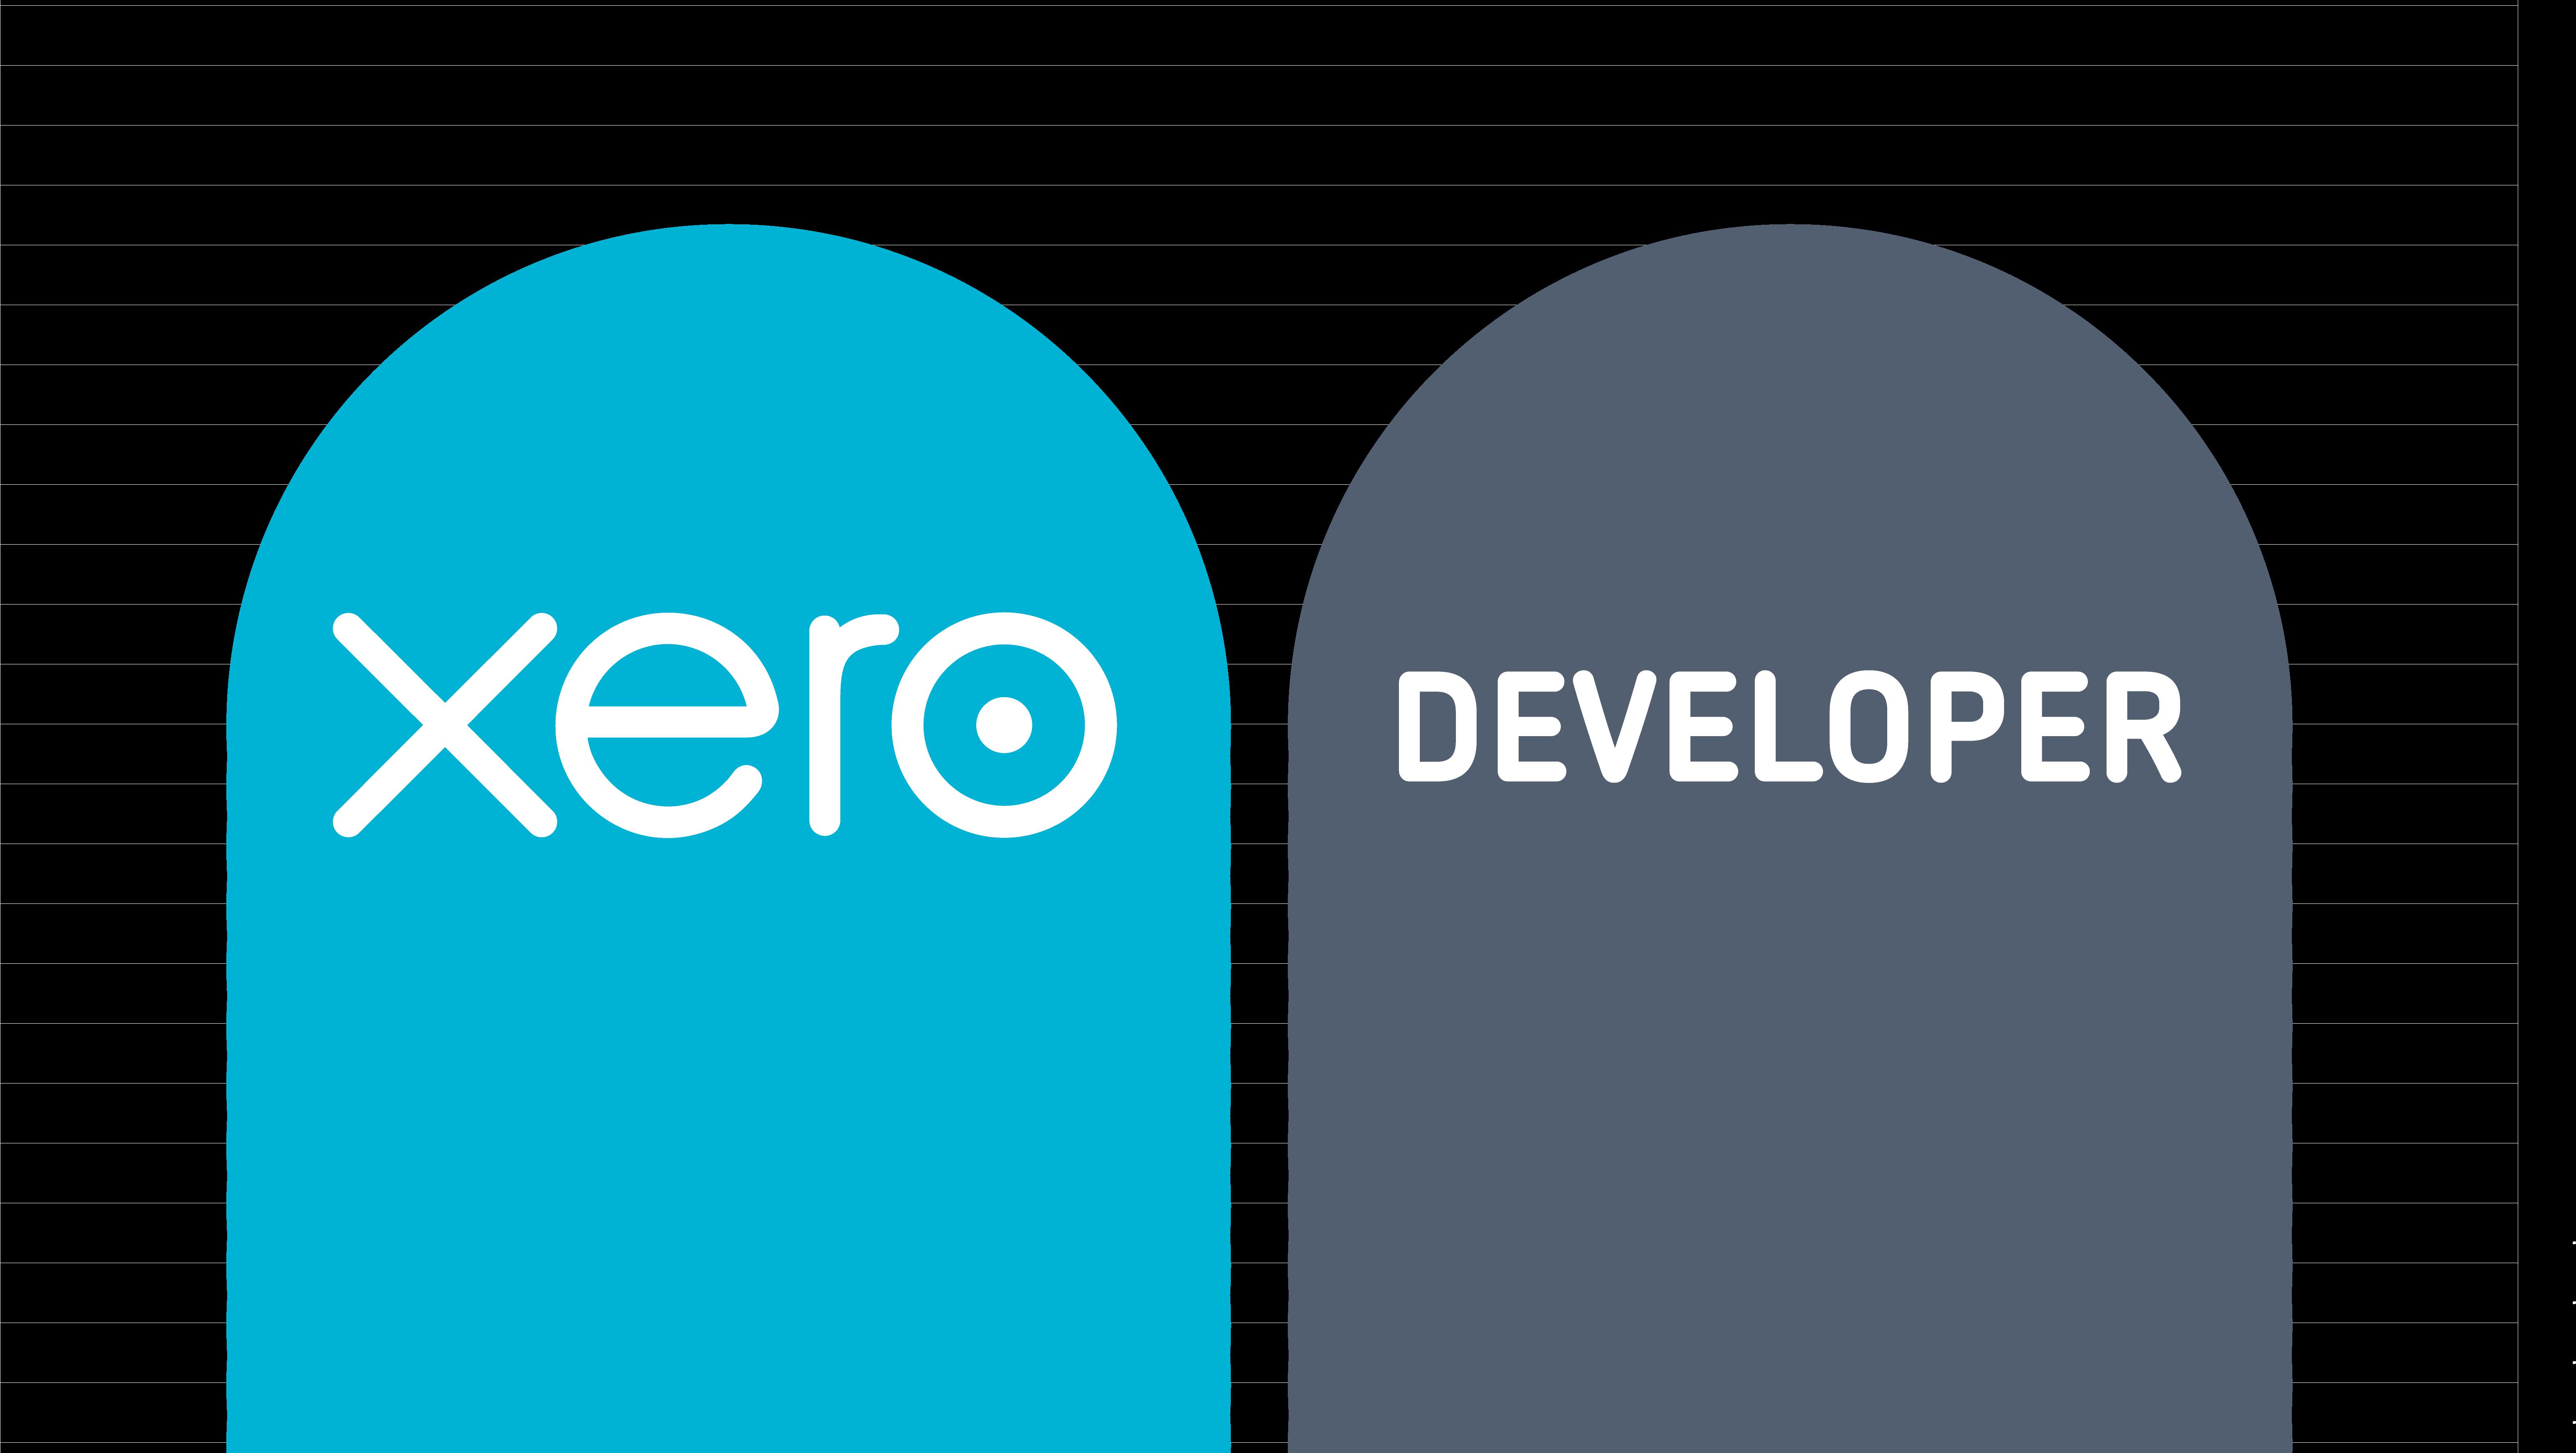 Xero Developer